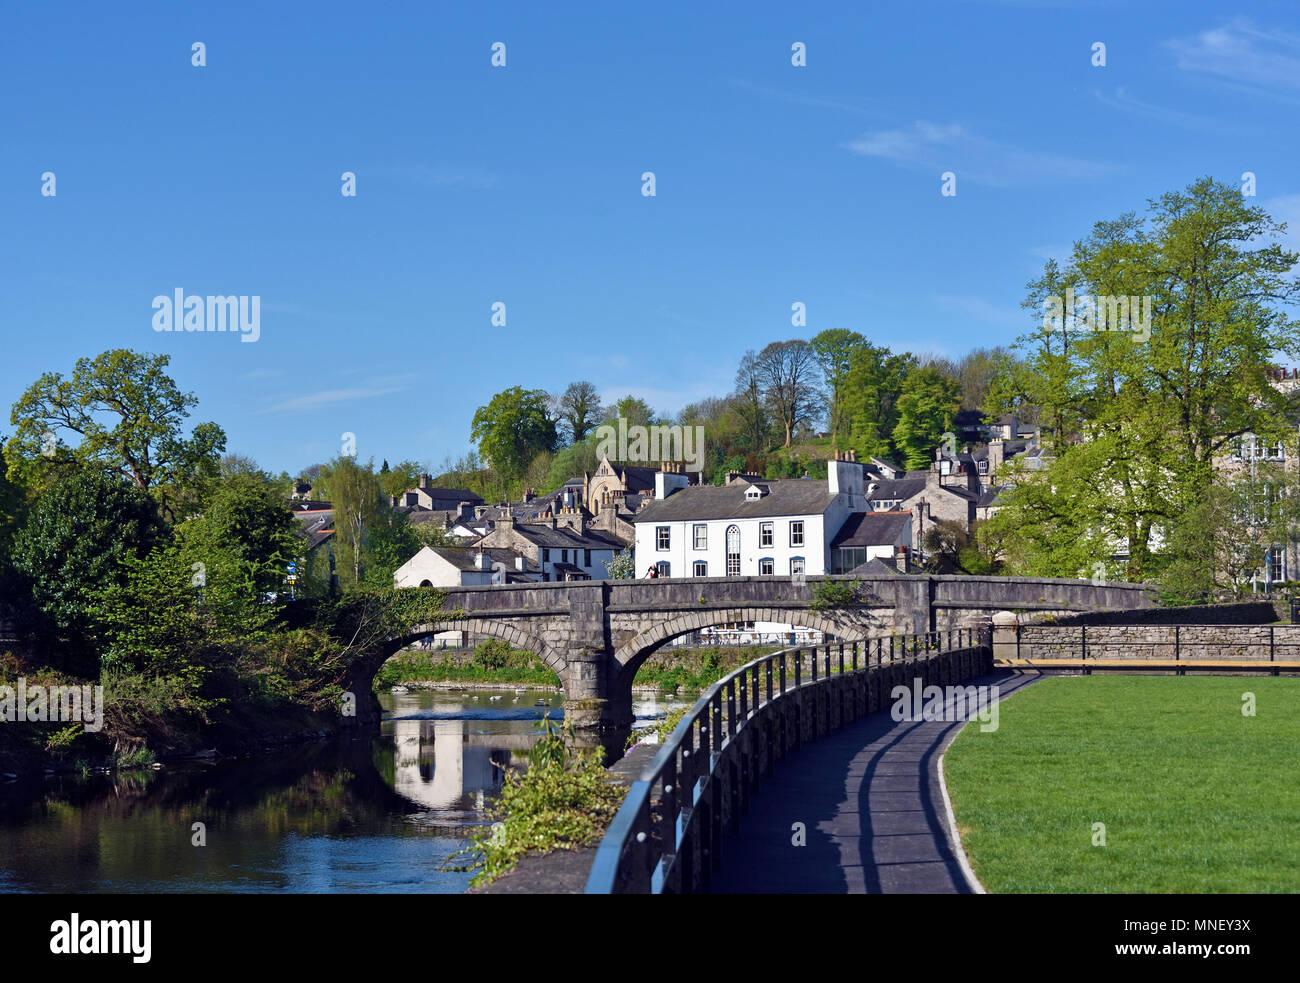 Miller Bridge and the River Kent. Kendal, Cumbria, England, United Kingdom, Europe. - Stock Image